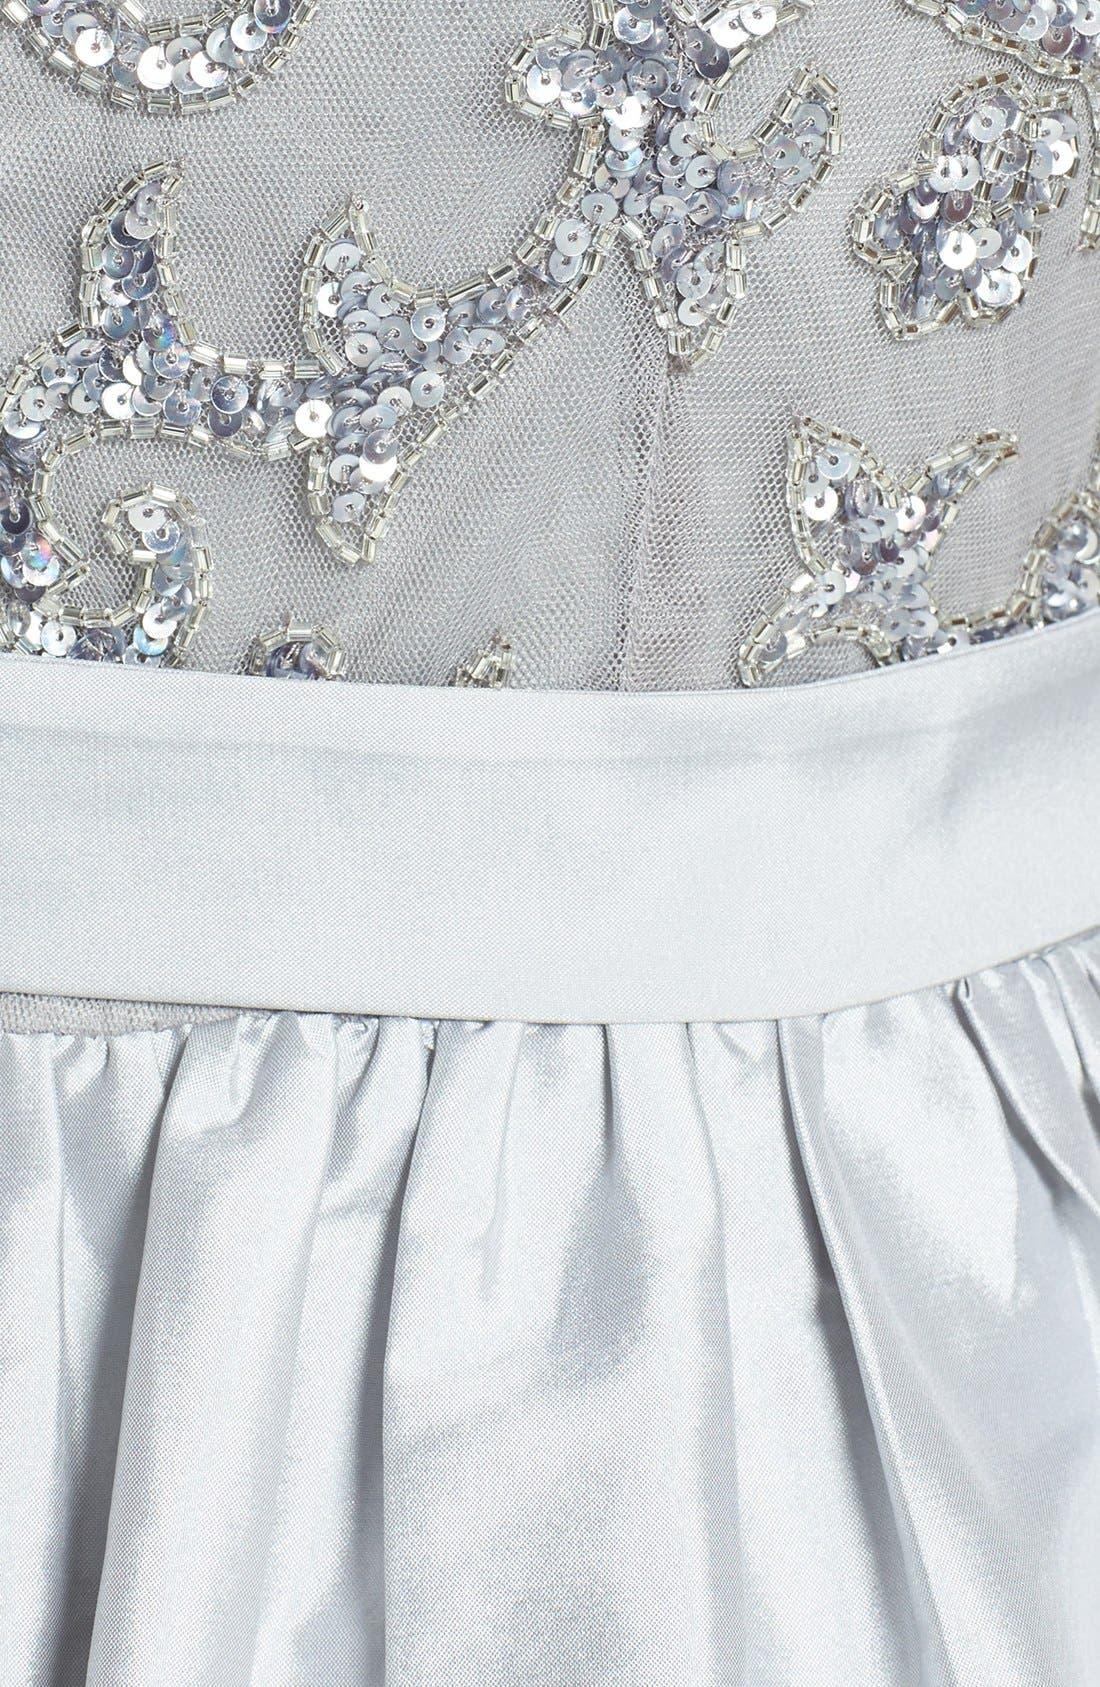 Embellished Bodice Taffeta Fit & Flare Dress,                             Alternate thumbnail 4, color,                             040